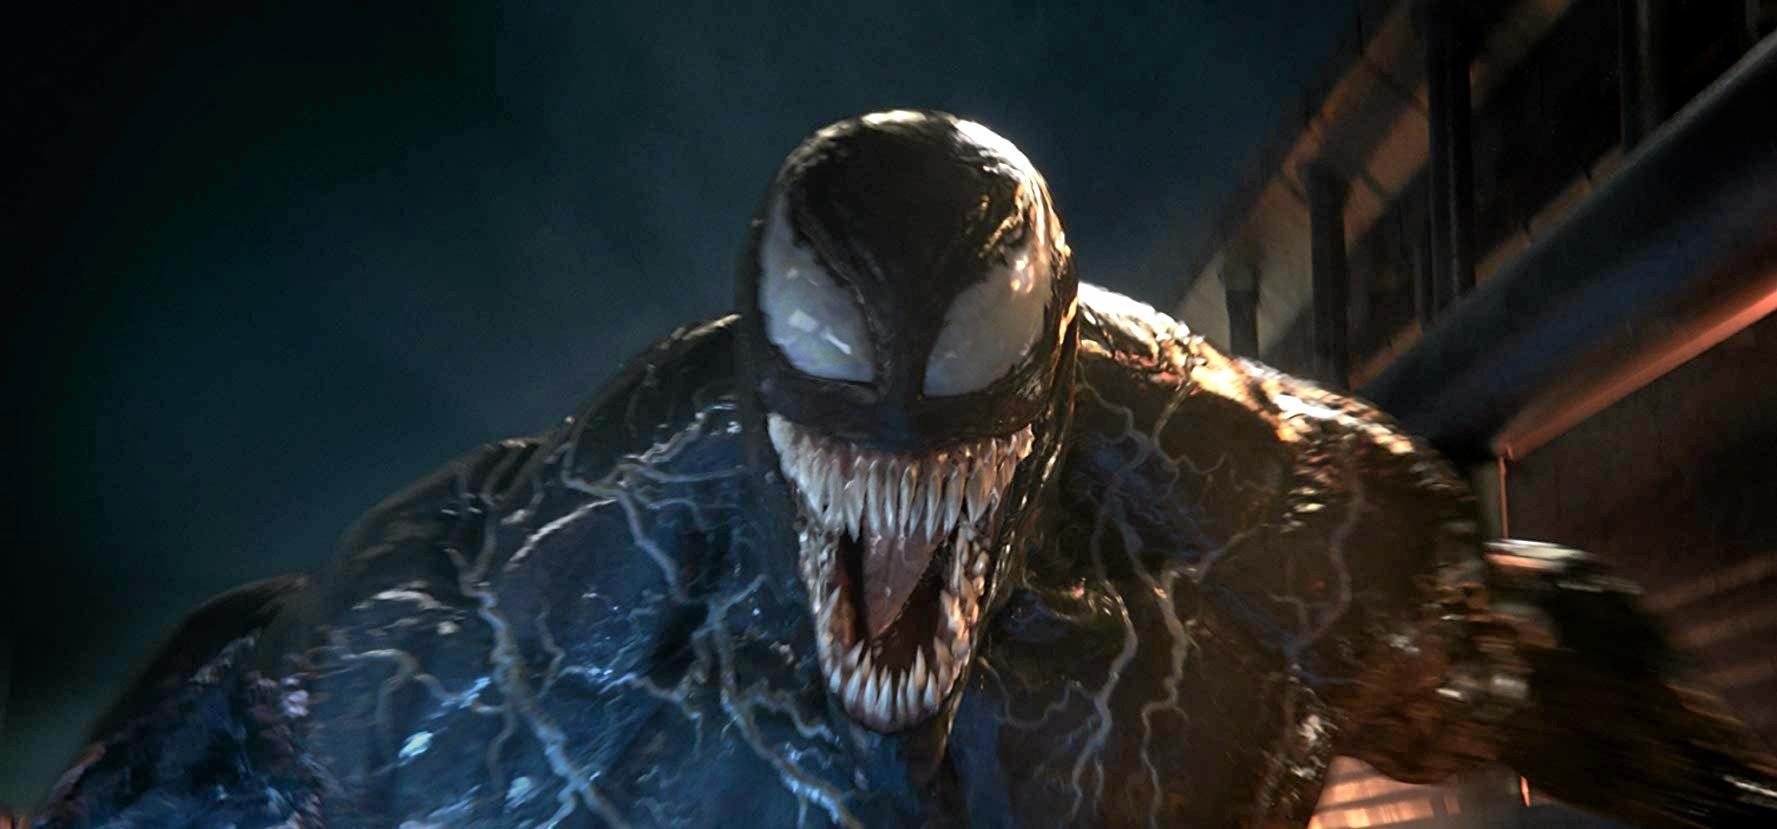 HE'S BACK: Venom.